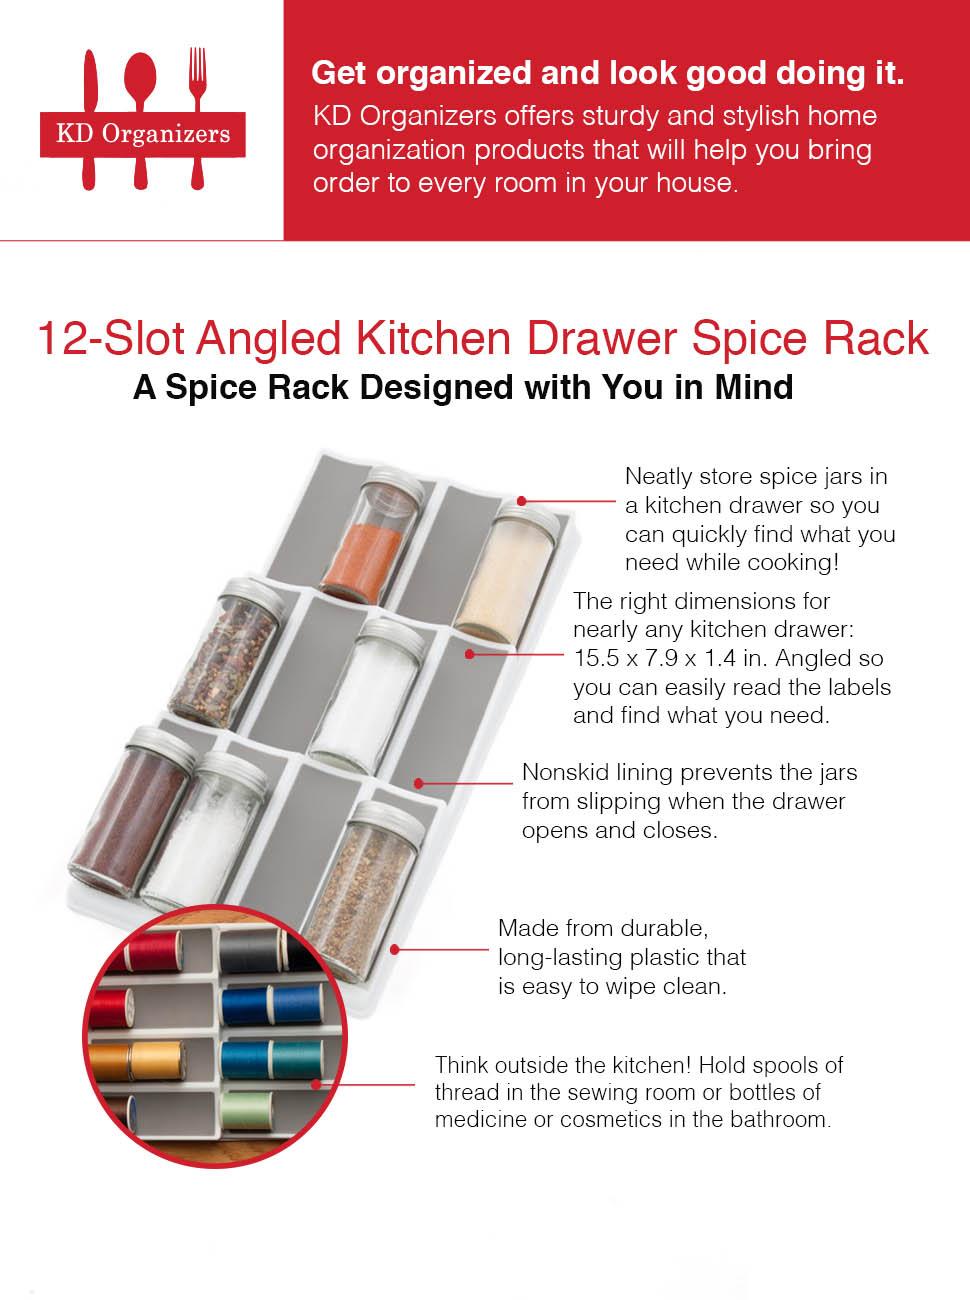 Kitchen drawer spice rack - Product Description